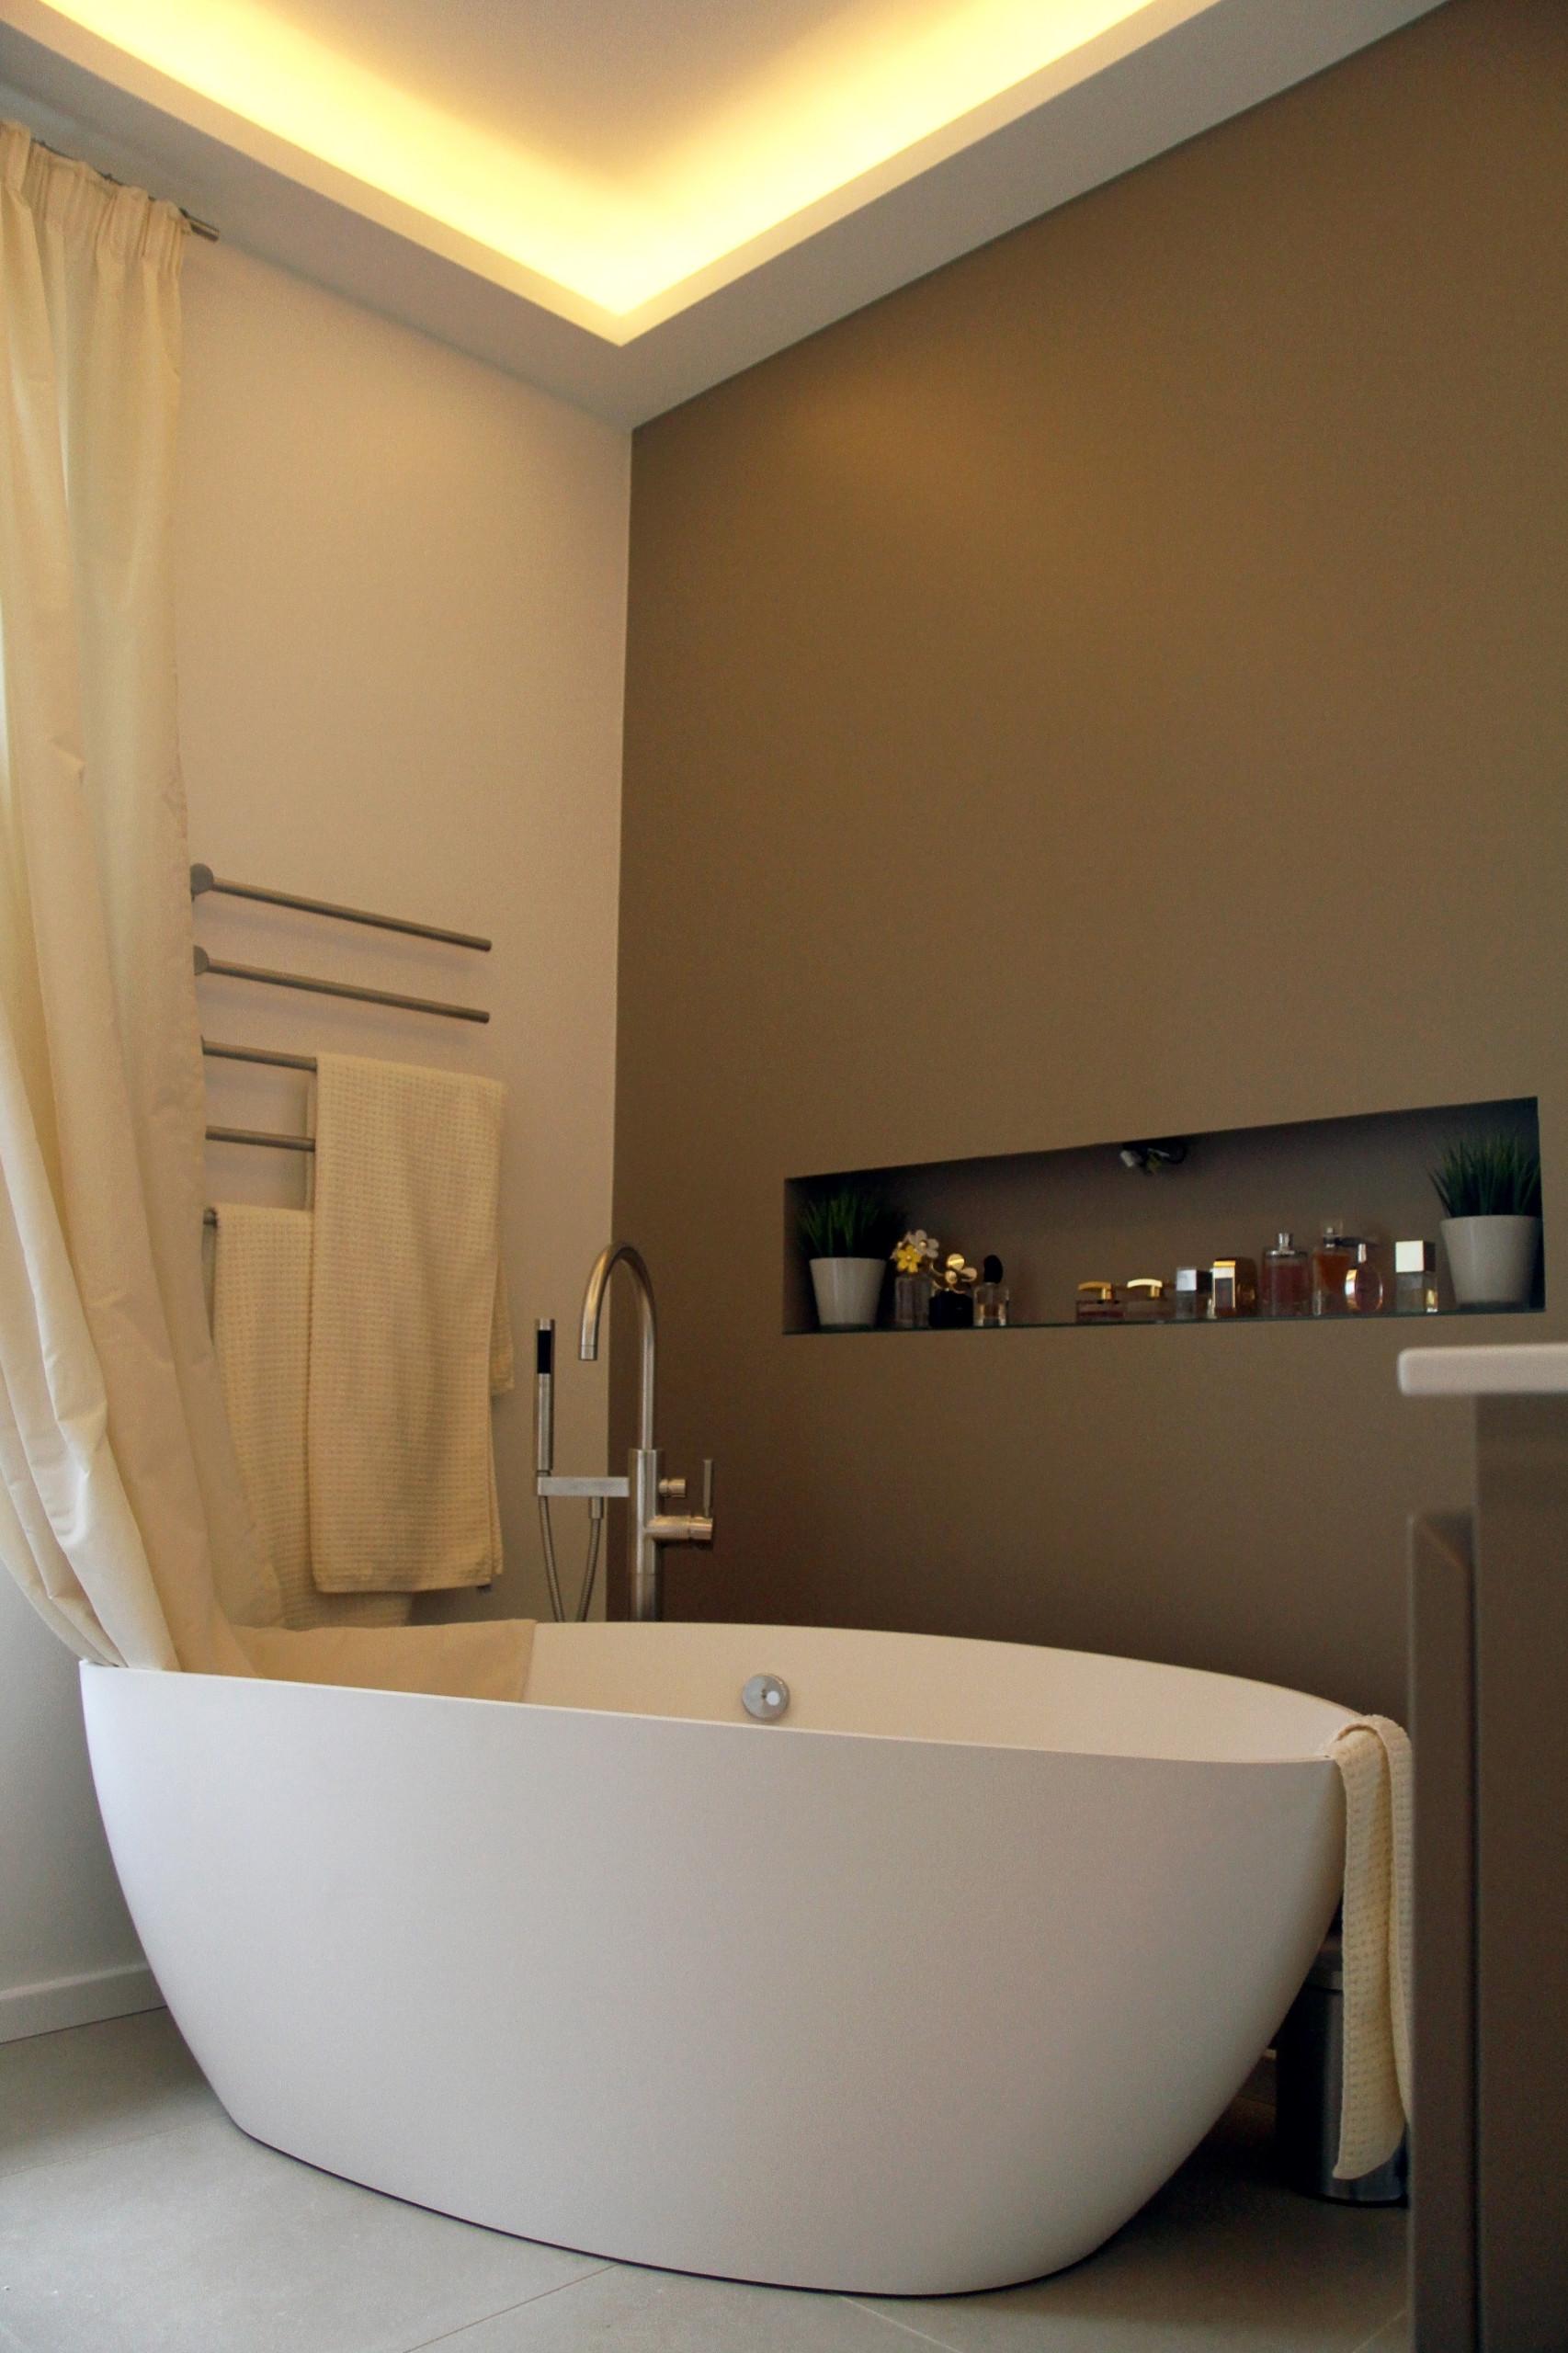 Wand | Decke | Badezimmer